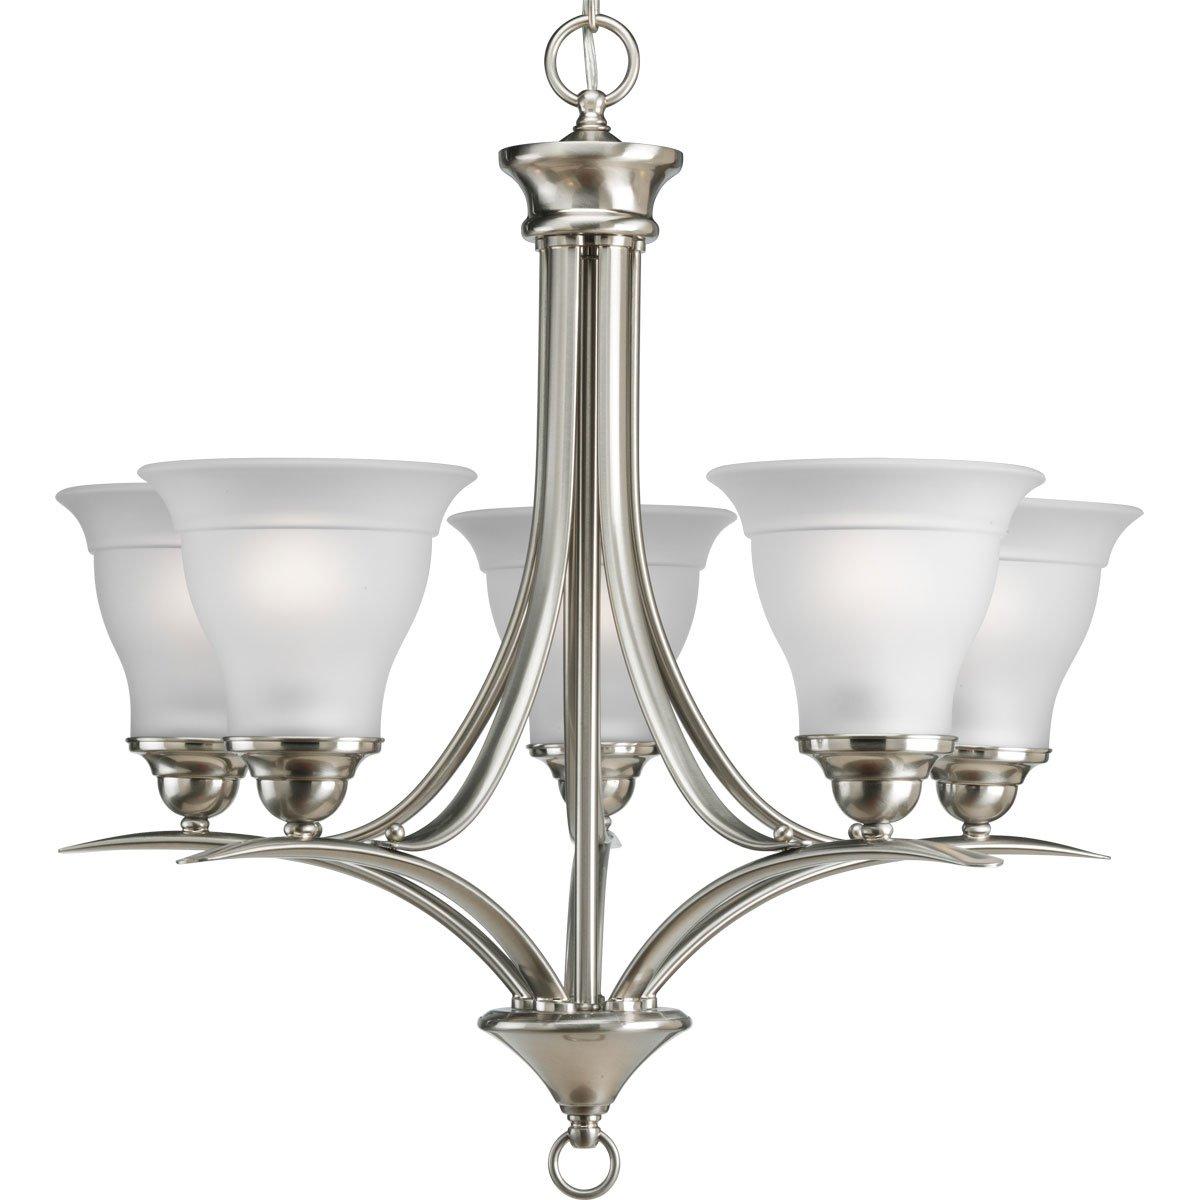 lights awesome light enchanting chandeliers lighting chandelier nickel brushed modern glass pendant